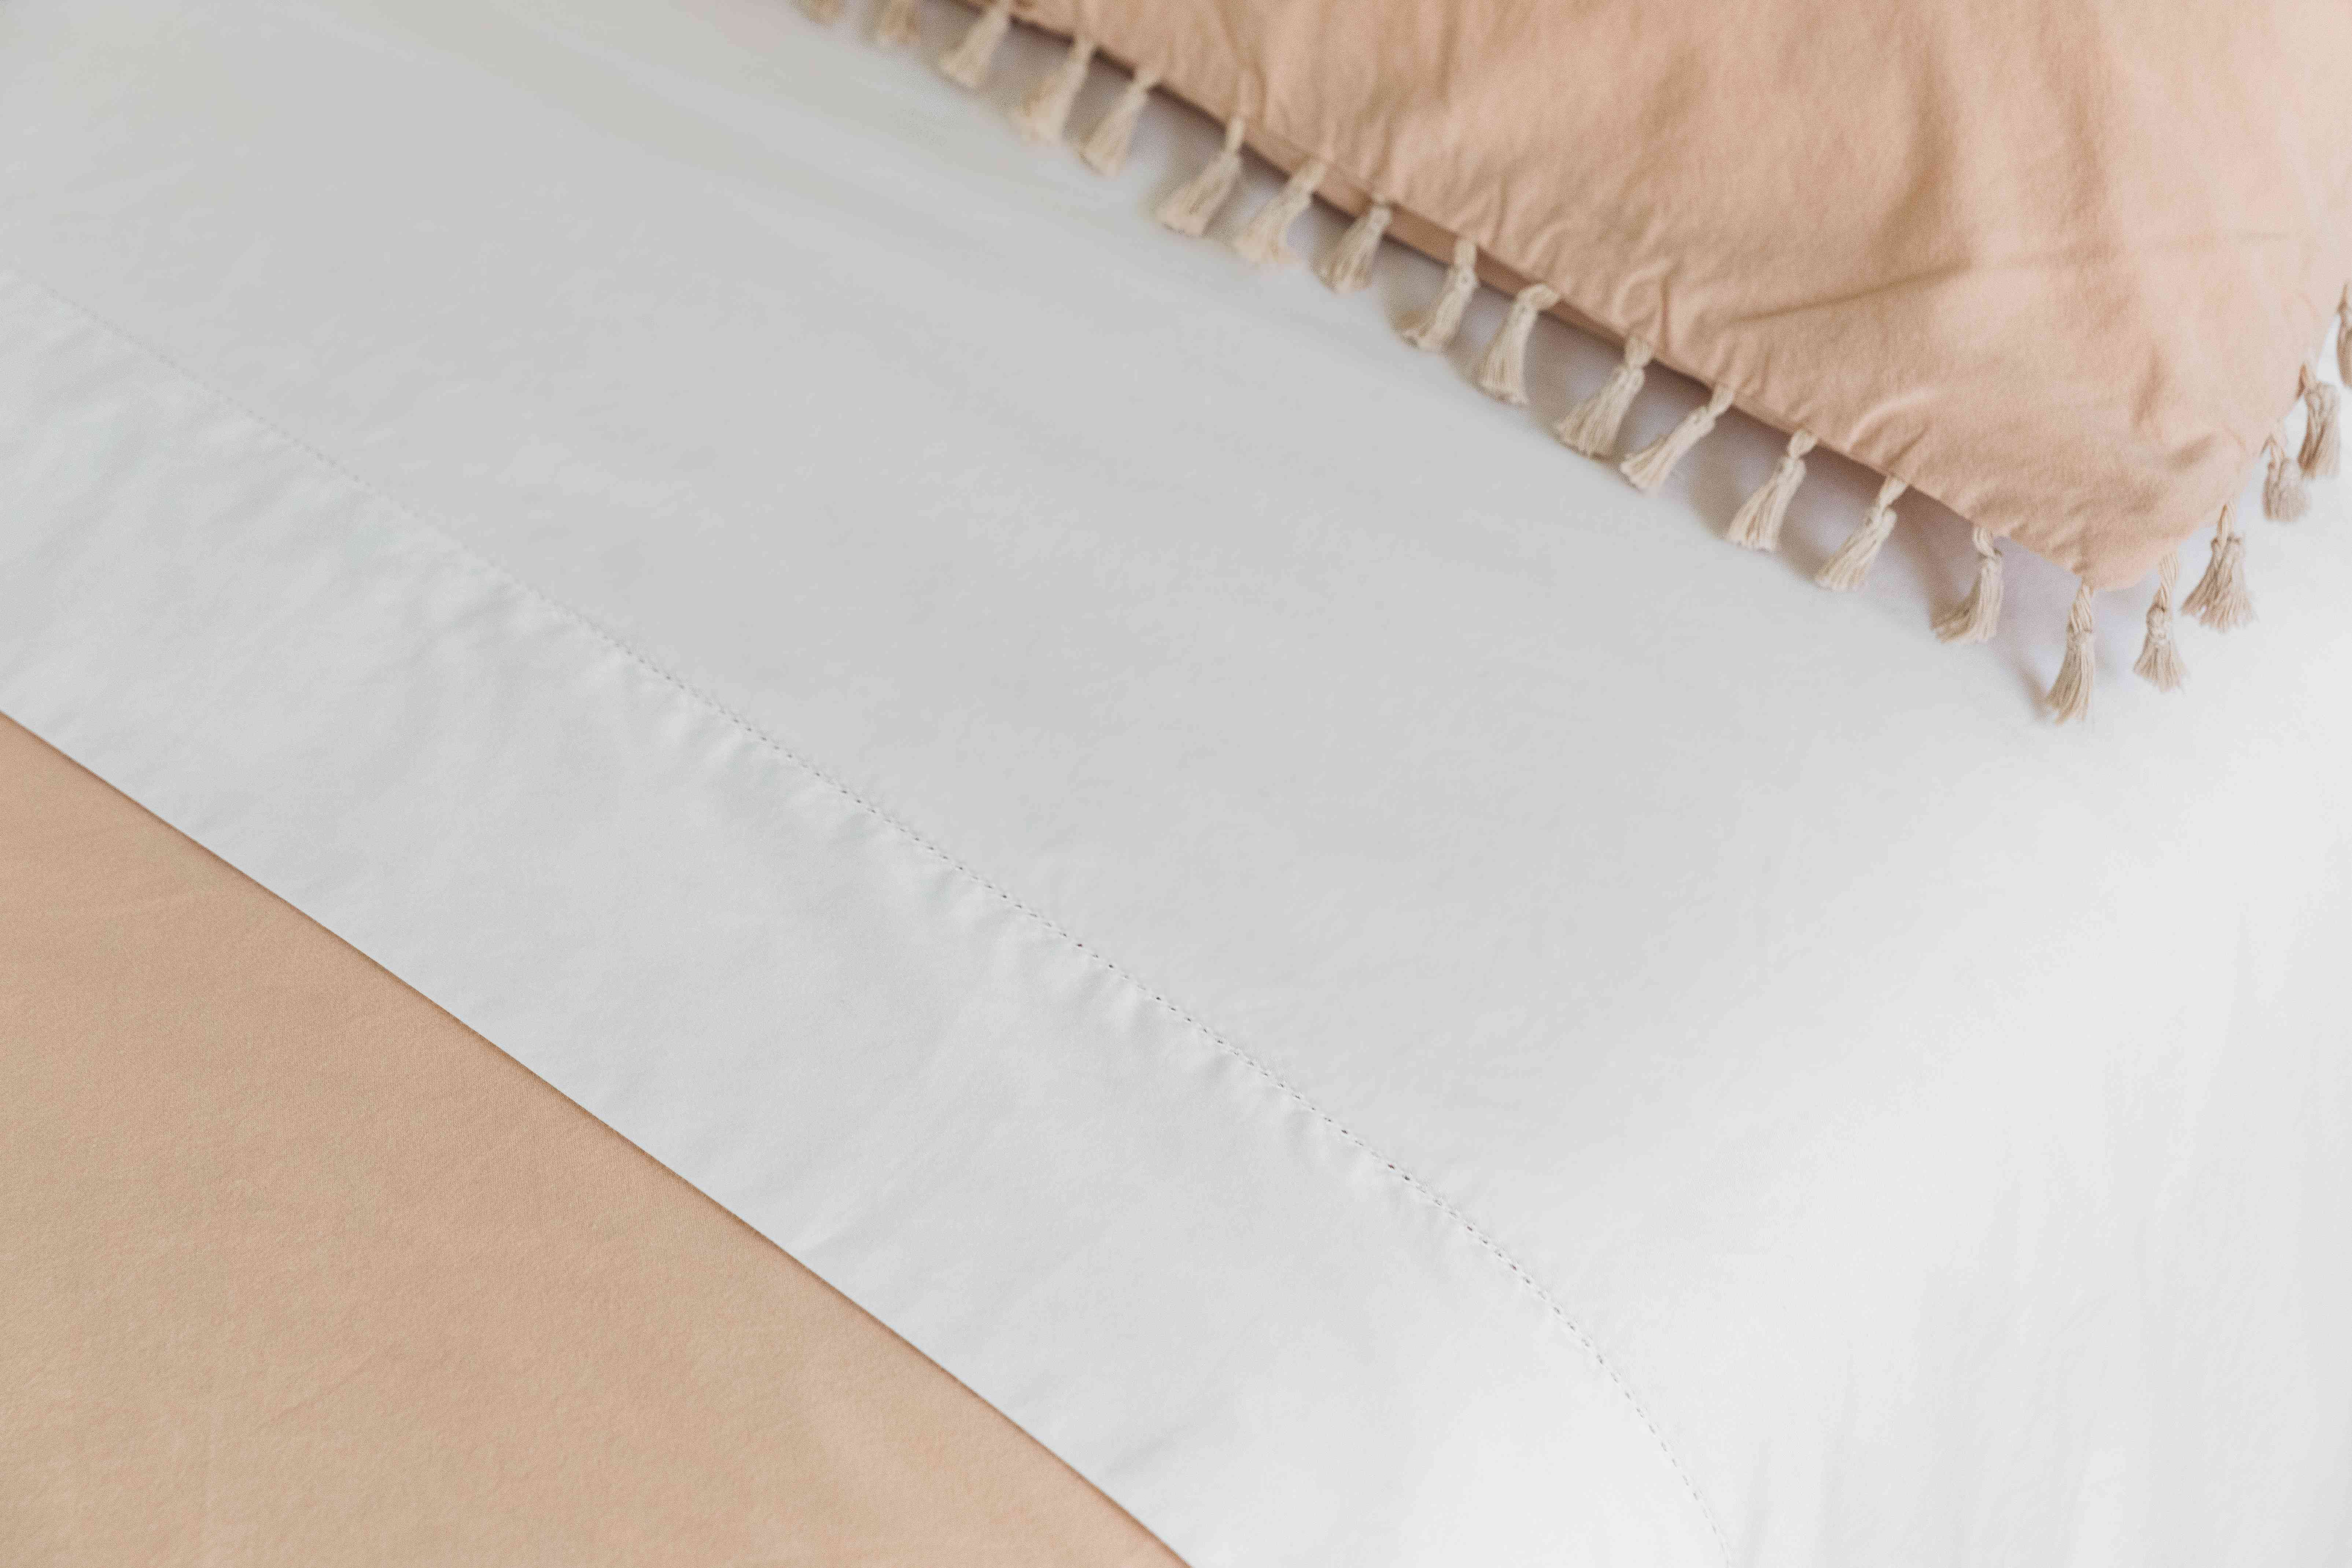 neatly folded and tucked sheets